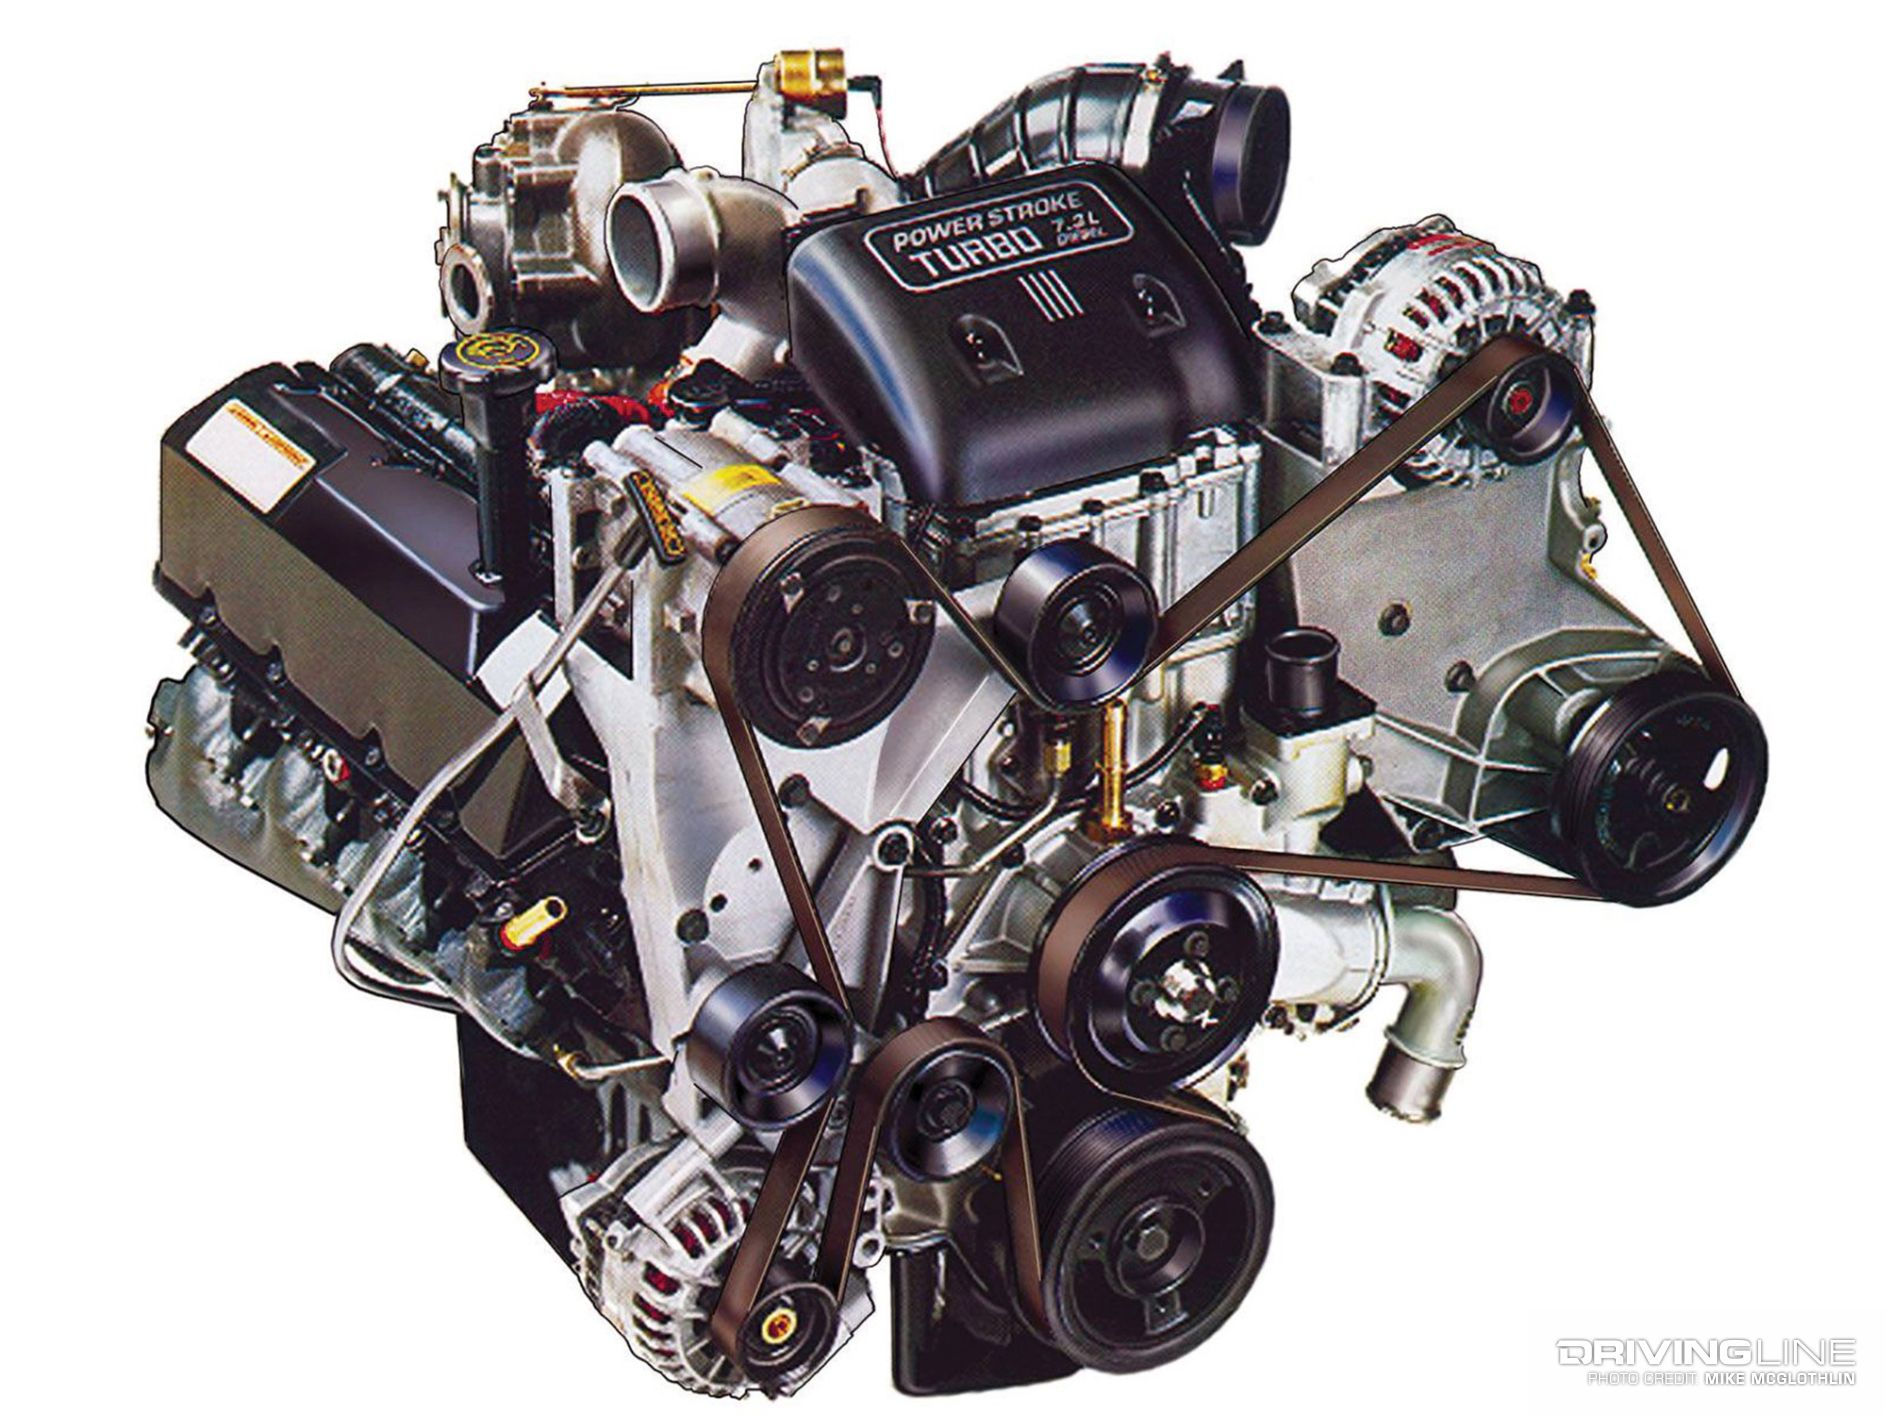 medium resolution of 7 3l vs 6 0l which power stroke is really better drivingline 7 3l powerstroke repair 2001 7 3l powerstroke engine diagram